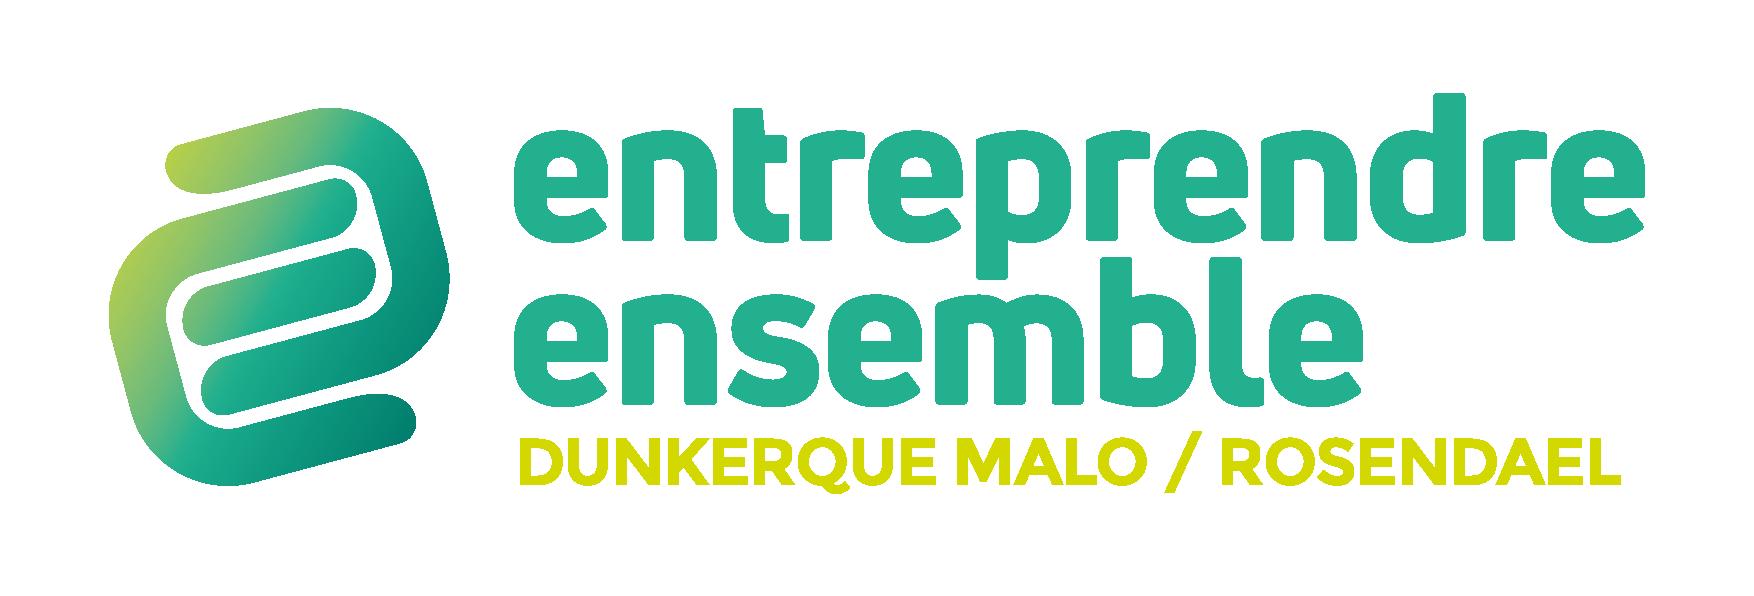 Logo-EE-DUNKERQUE MALO – ROSENDAEL_150dpi